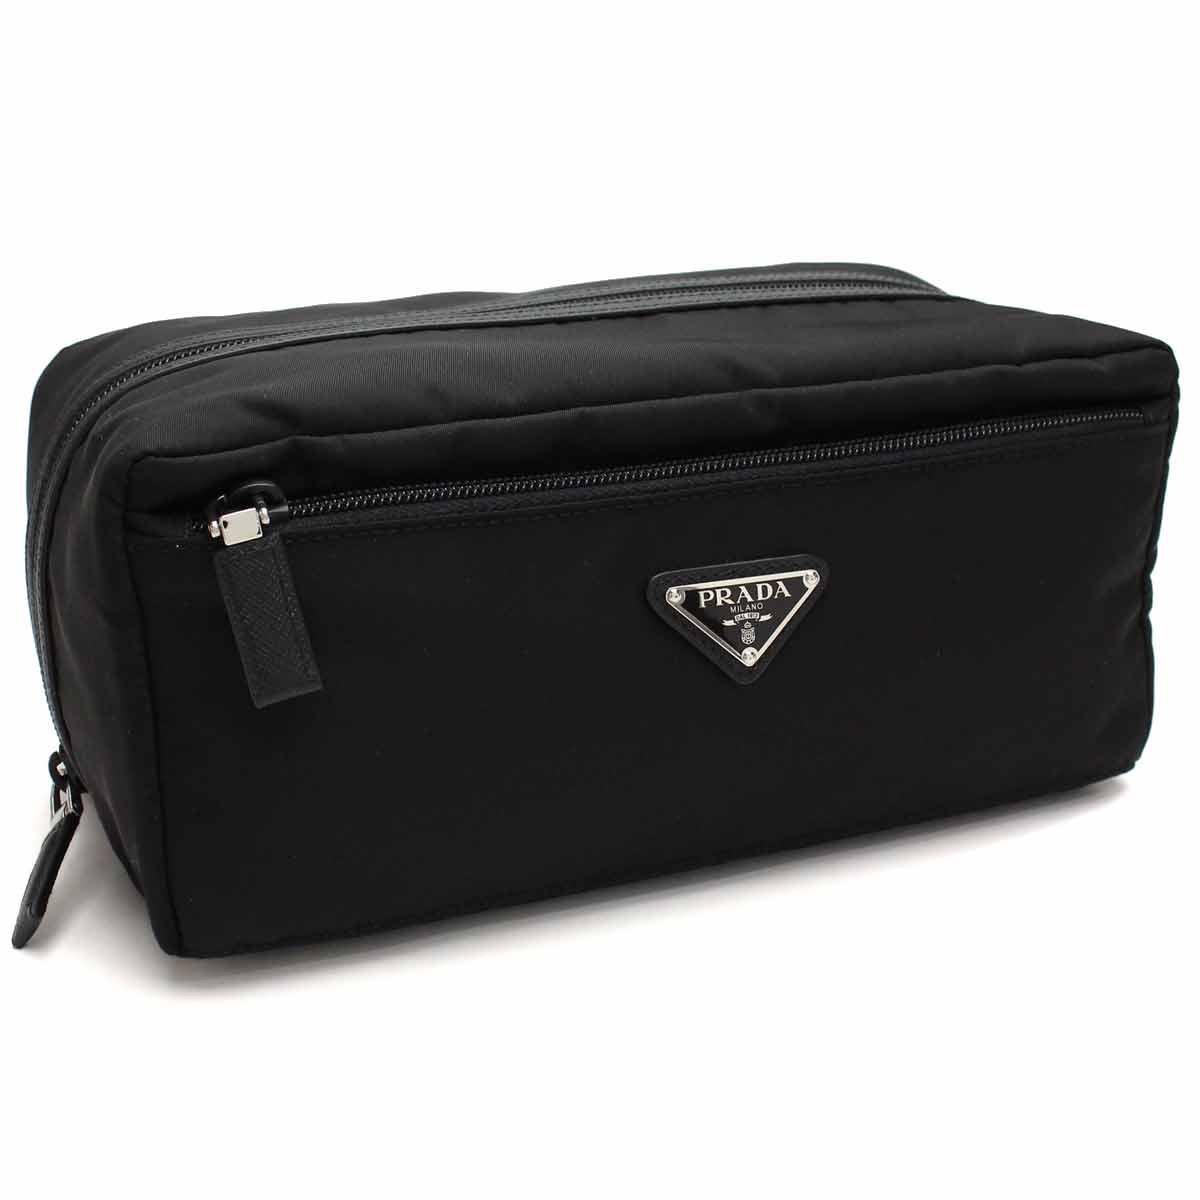 b17a86a6ef Bighit The total brand wholesale  Prada (PRADA) nylon Cosme pouch makeup bag  2NA029 064 F 0002 NERO black